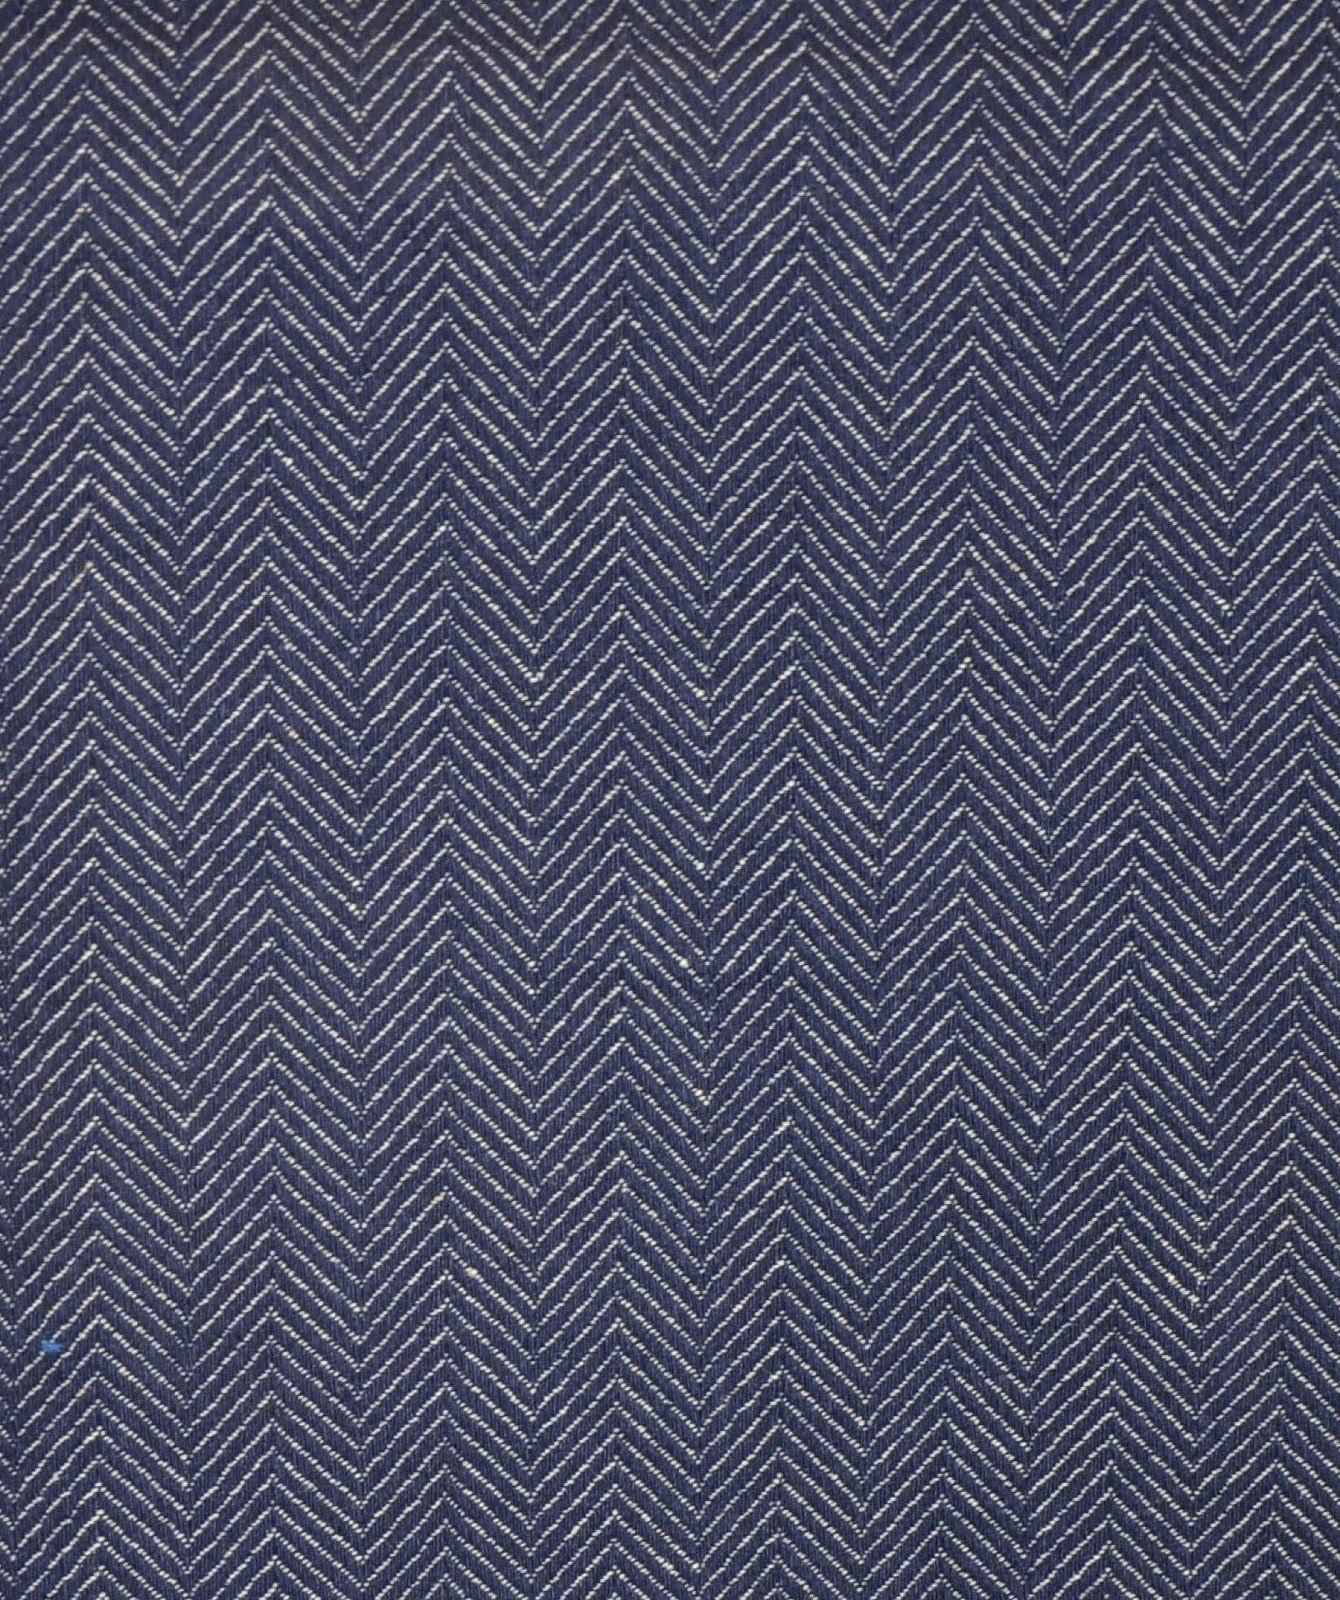 Tissu d'ameublement grande largeur Jacquard Collection cosmos-bleu de thevenon